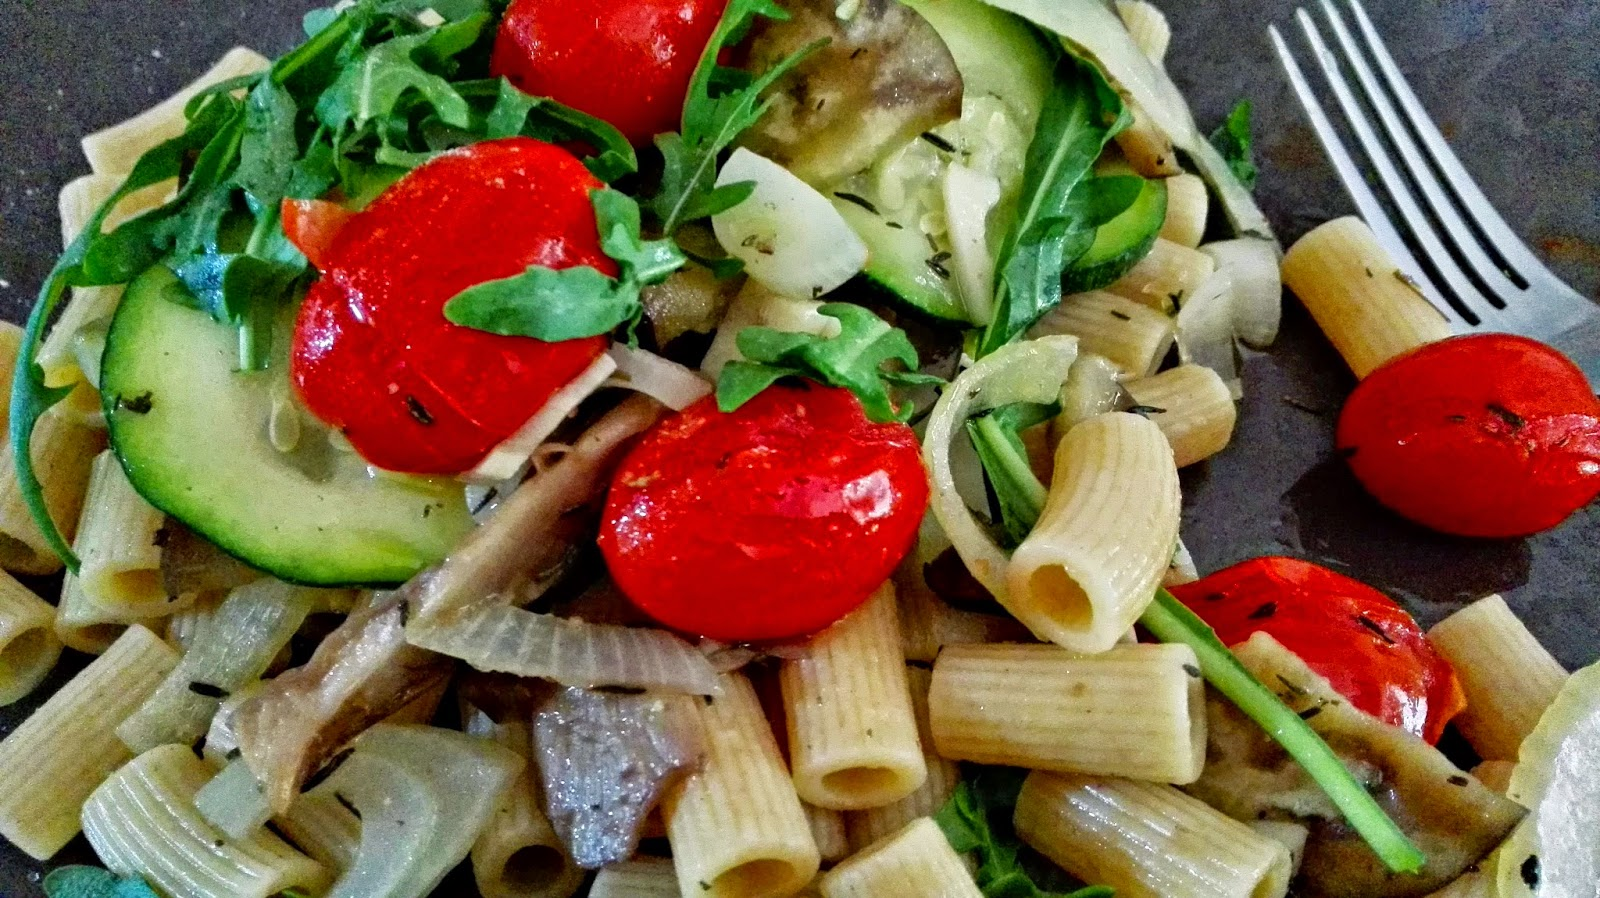 Verdelicioso macarrones con verduras al horno y r cula - Macarrones con verduras al horno ...